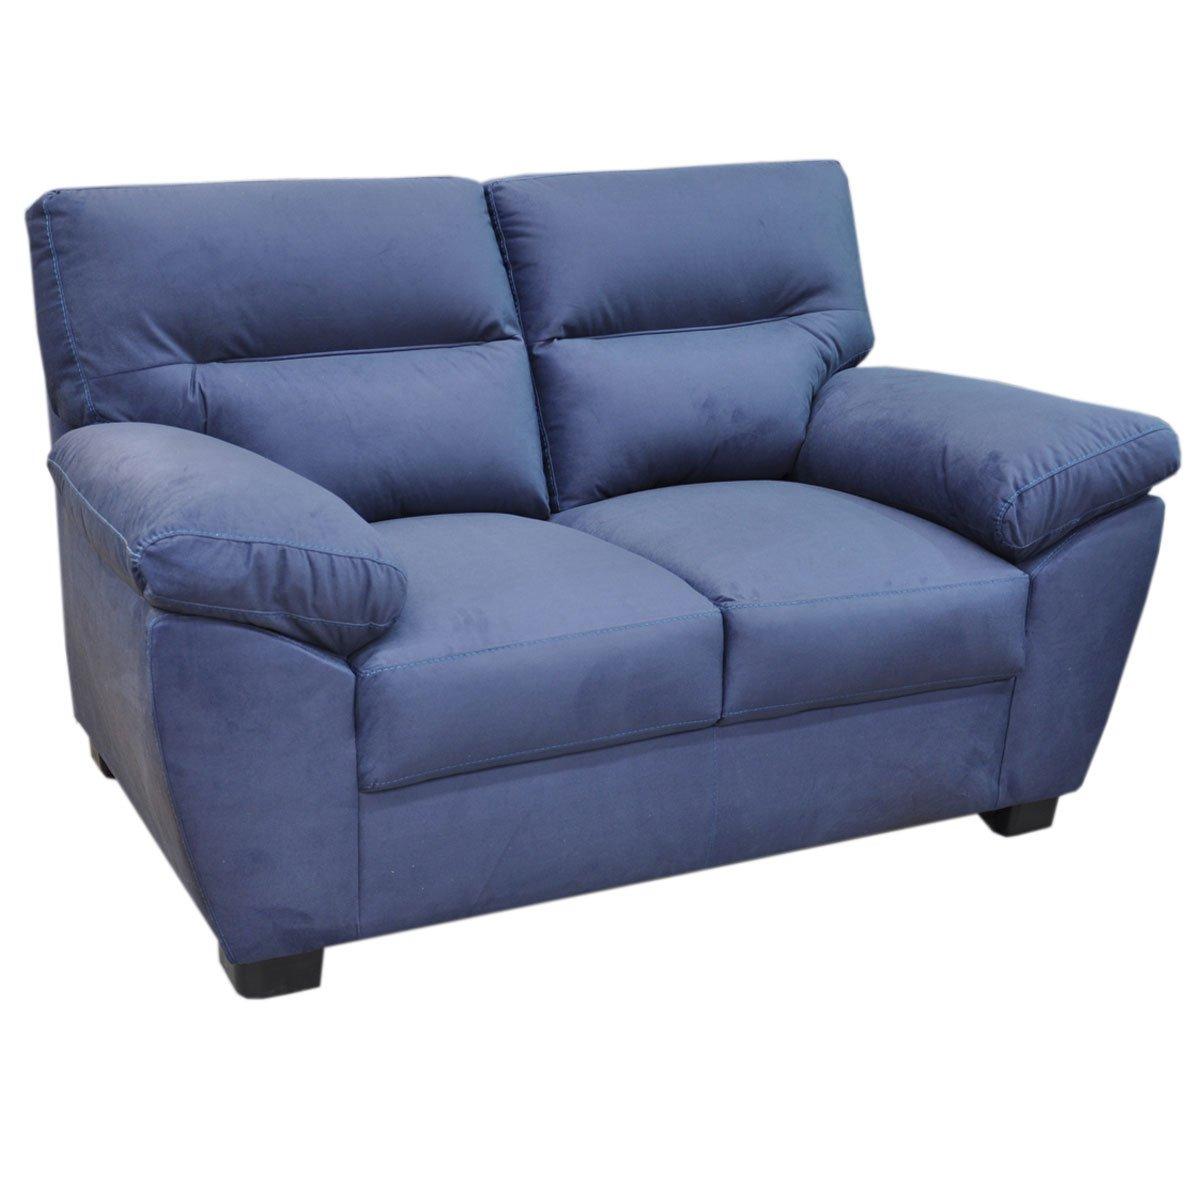 Love Seat Bartra Tapiz Tela Azul Muebles Liz Sears Com Mx Me  # Muebles Liz Sears